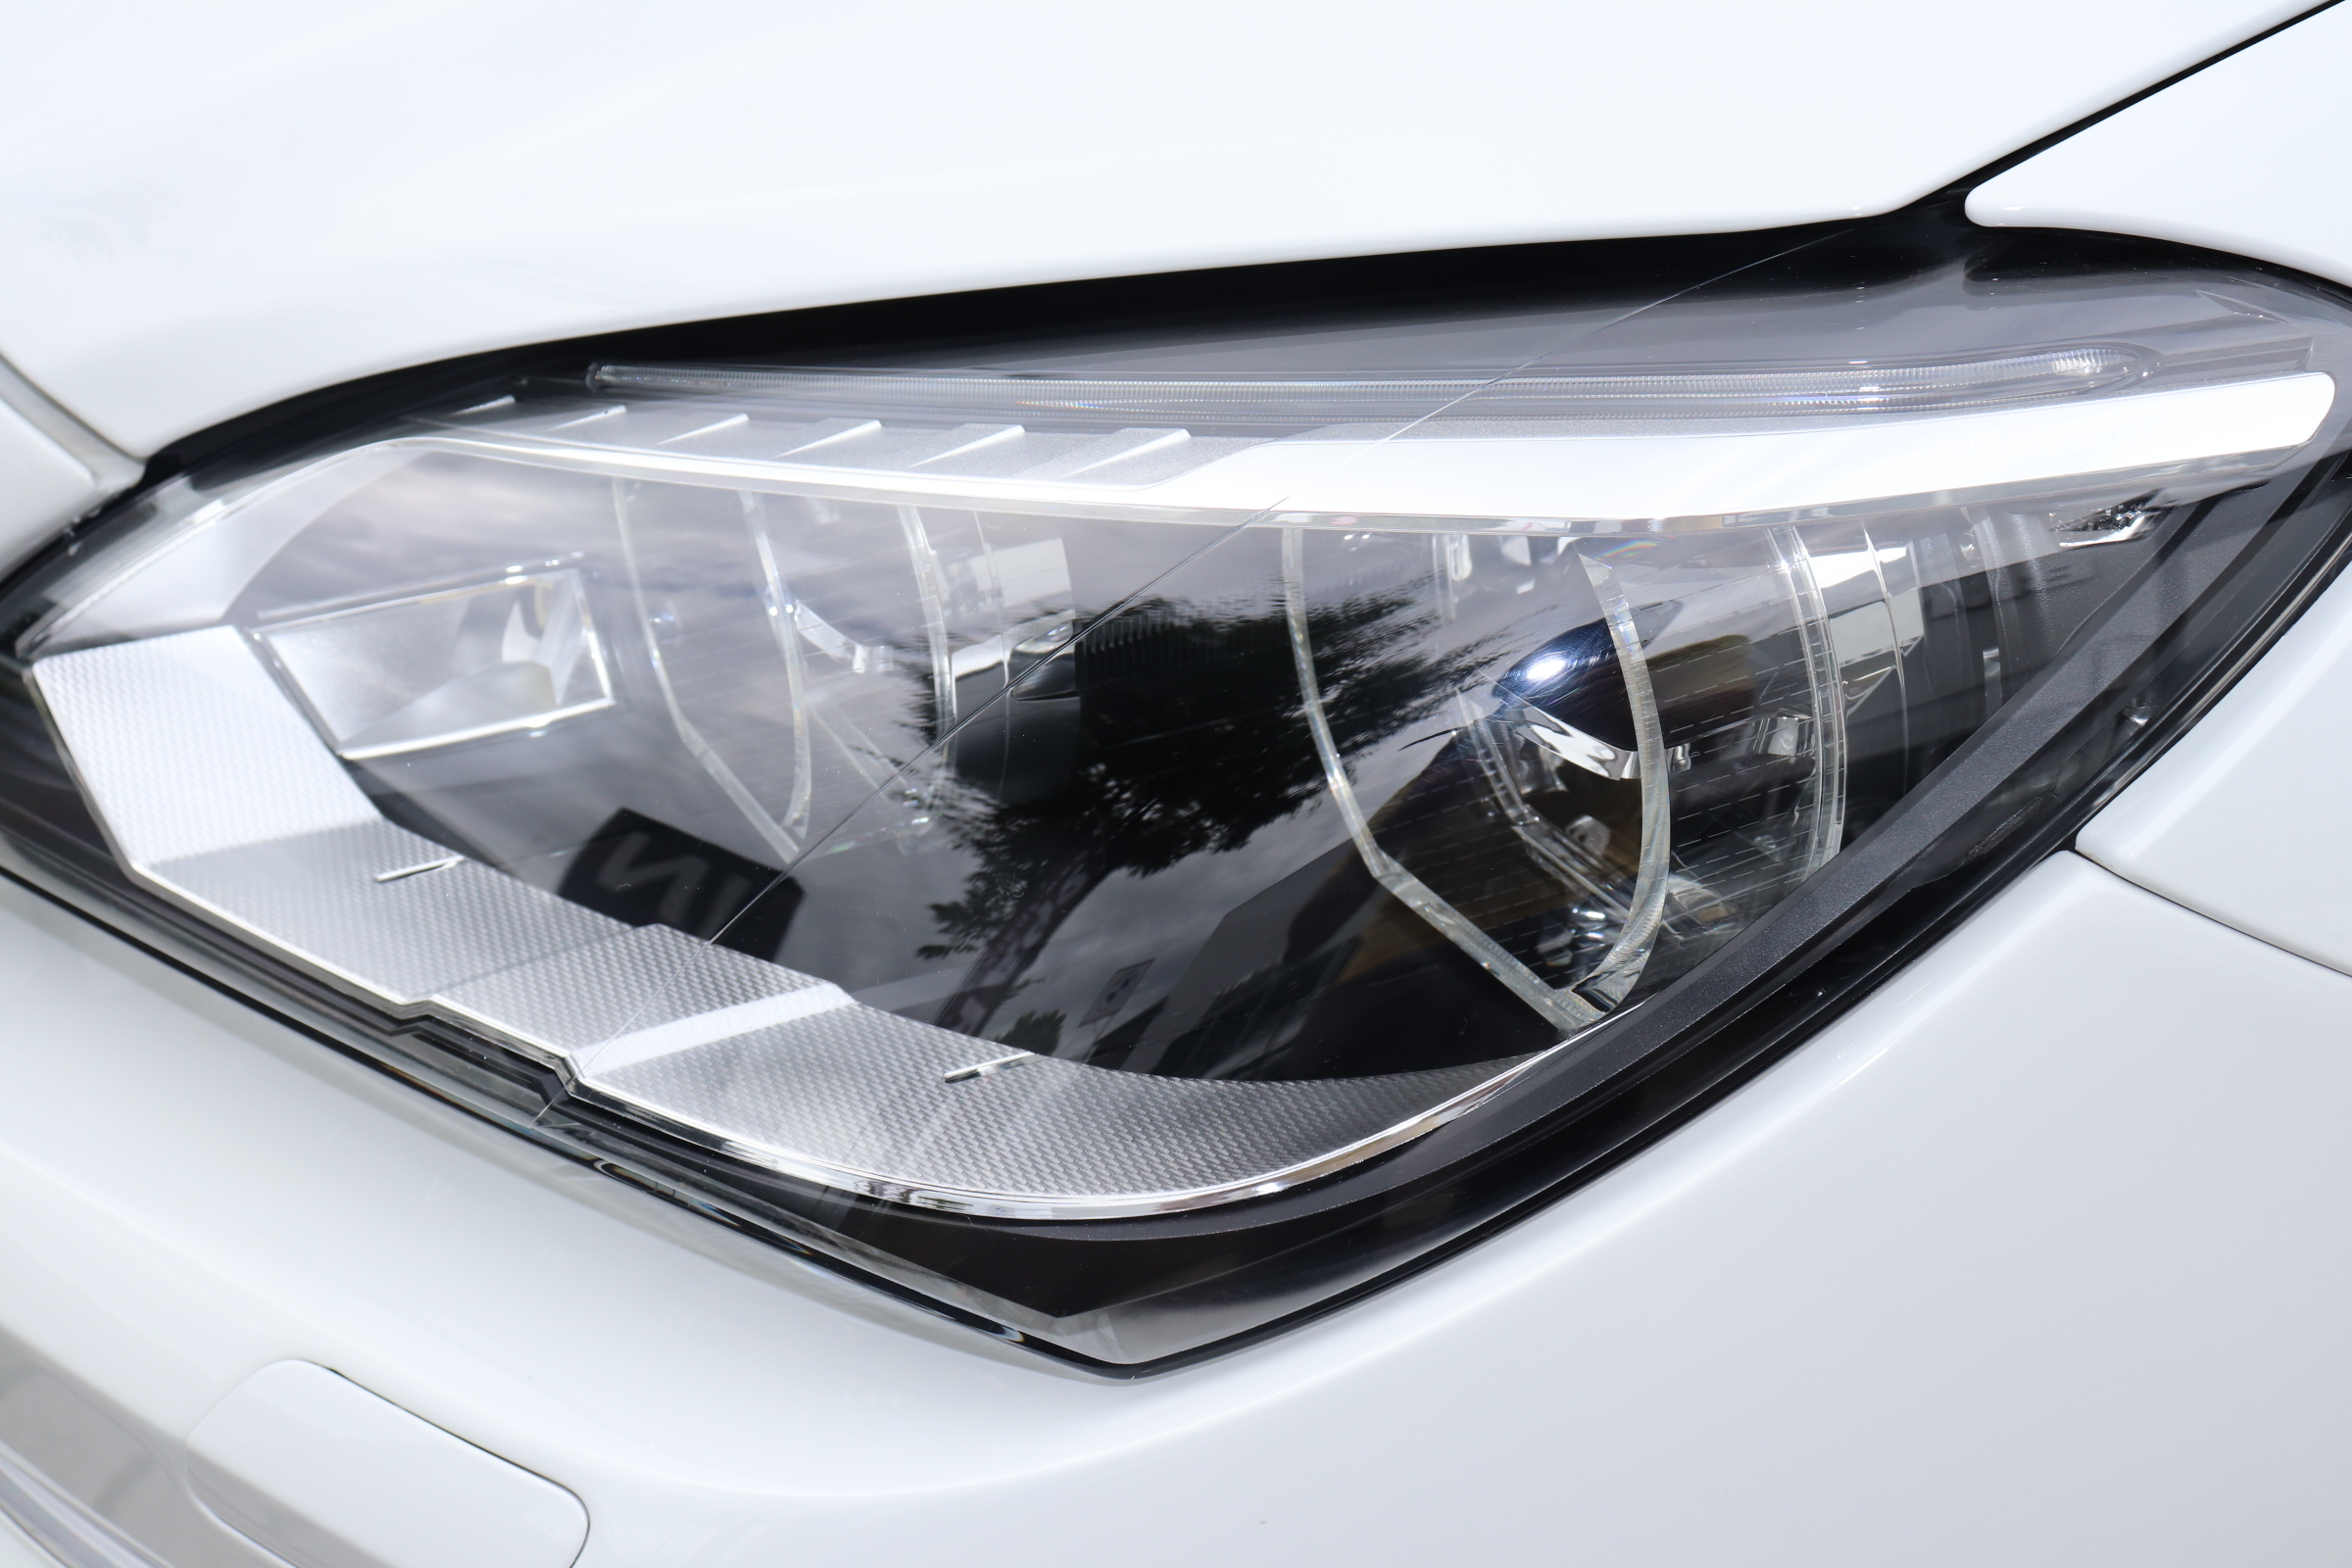 640i BEAMコンプリートカー LEDヘッドライト ブラックレザーシート サンルーフ車両画像10